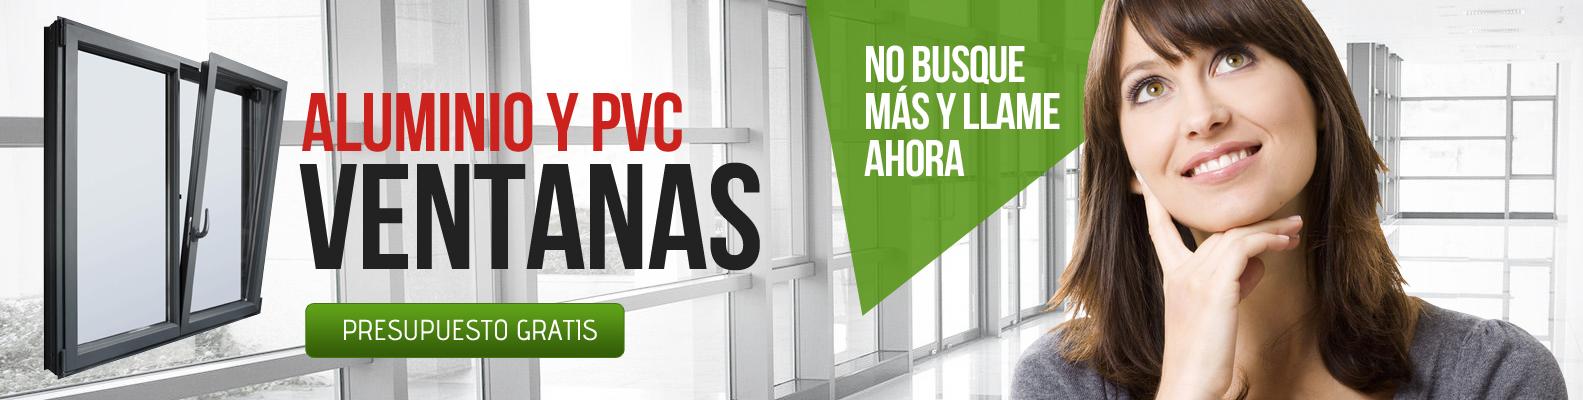 Ventanas de PVC en Zaragoza